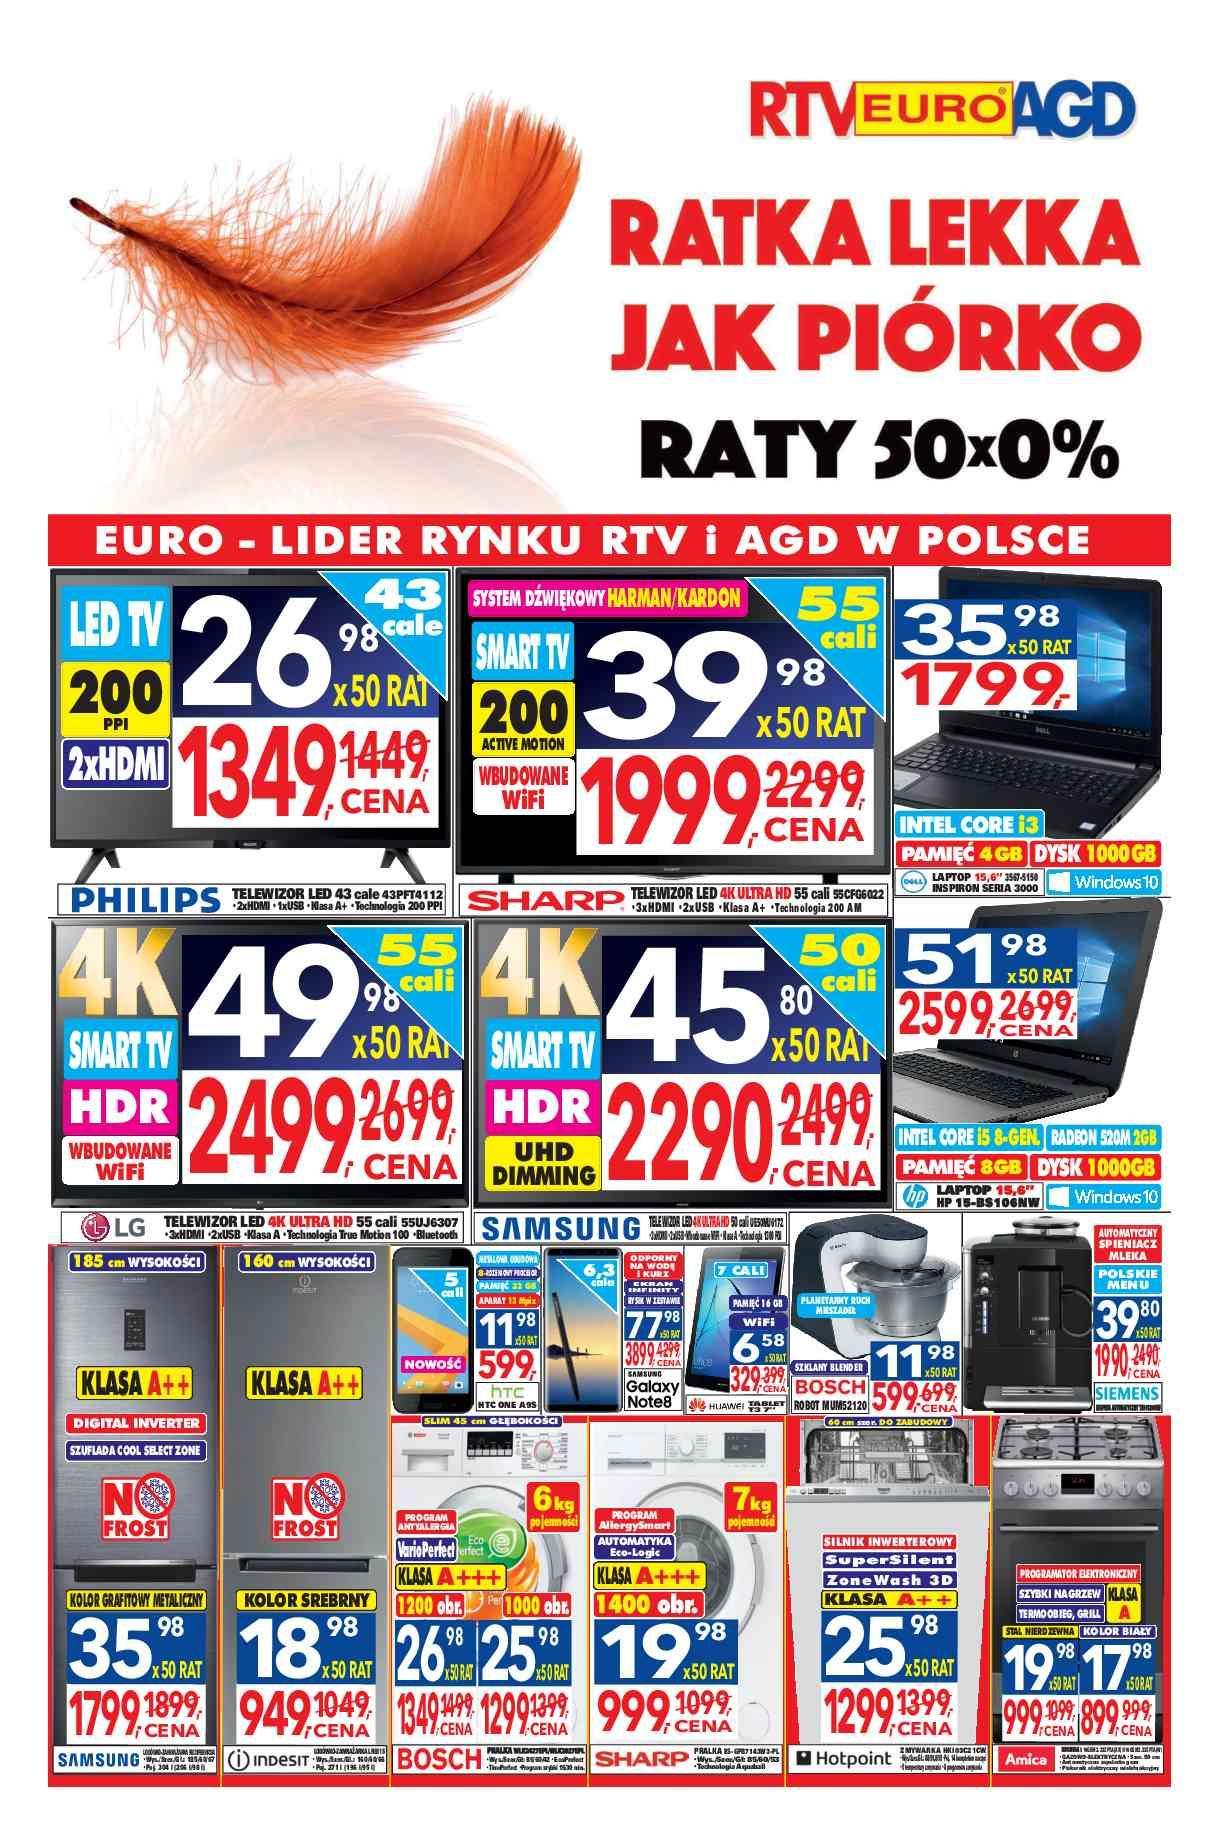 Gazetka promocyjna RTV Euro AGD do 08/02/2018 str.0